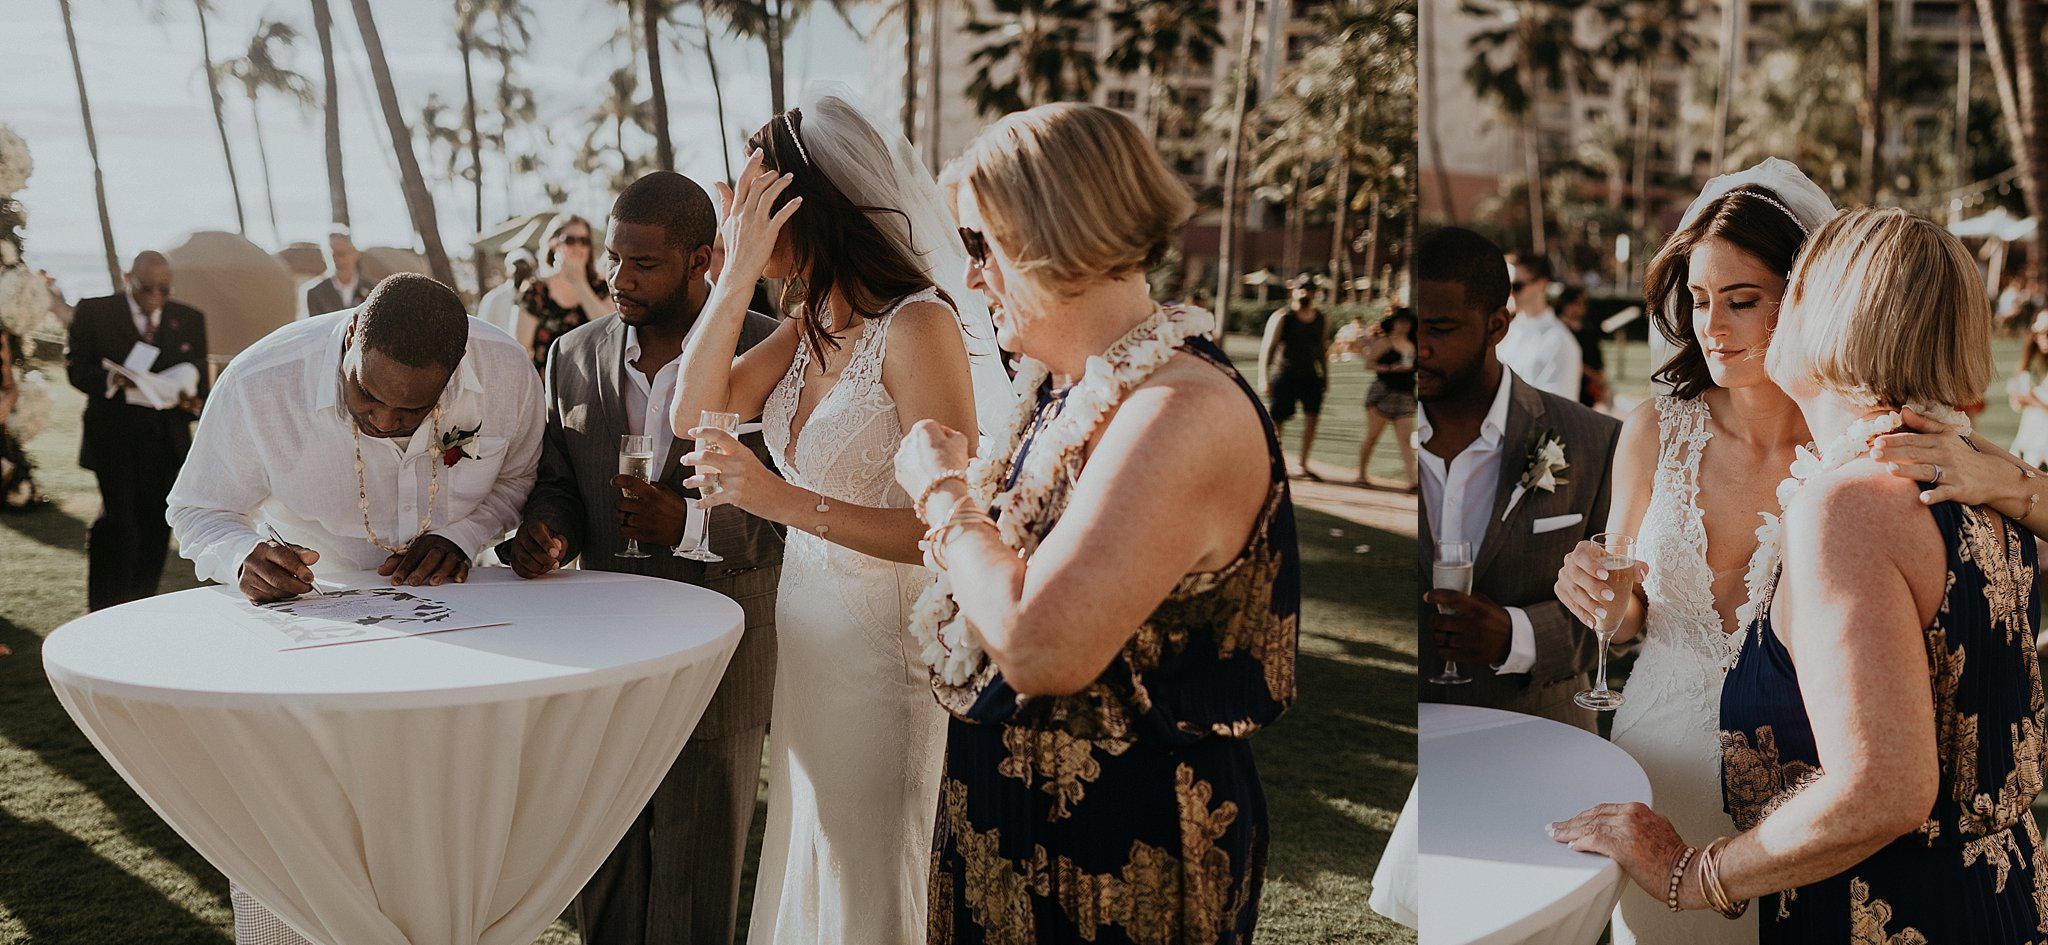 samantha_mcfarlen_bellingham_washington_engagement_photography_seattle_wedding_photographer_0218.jpg